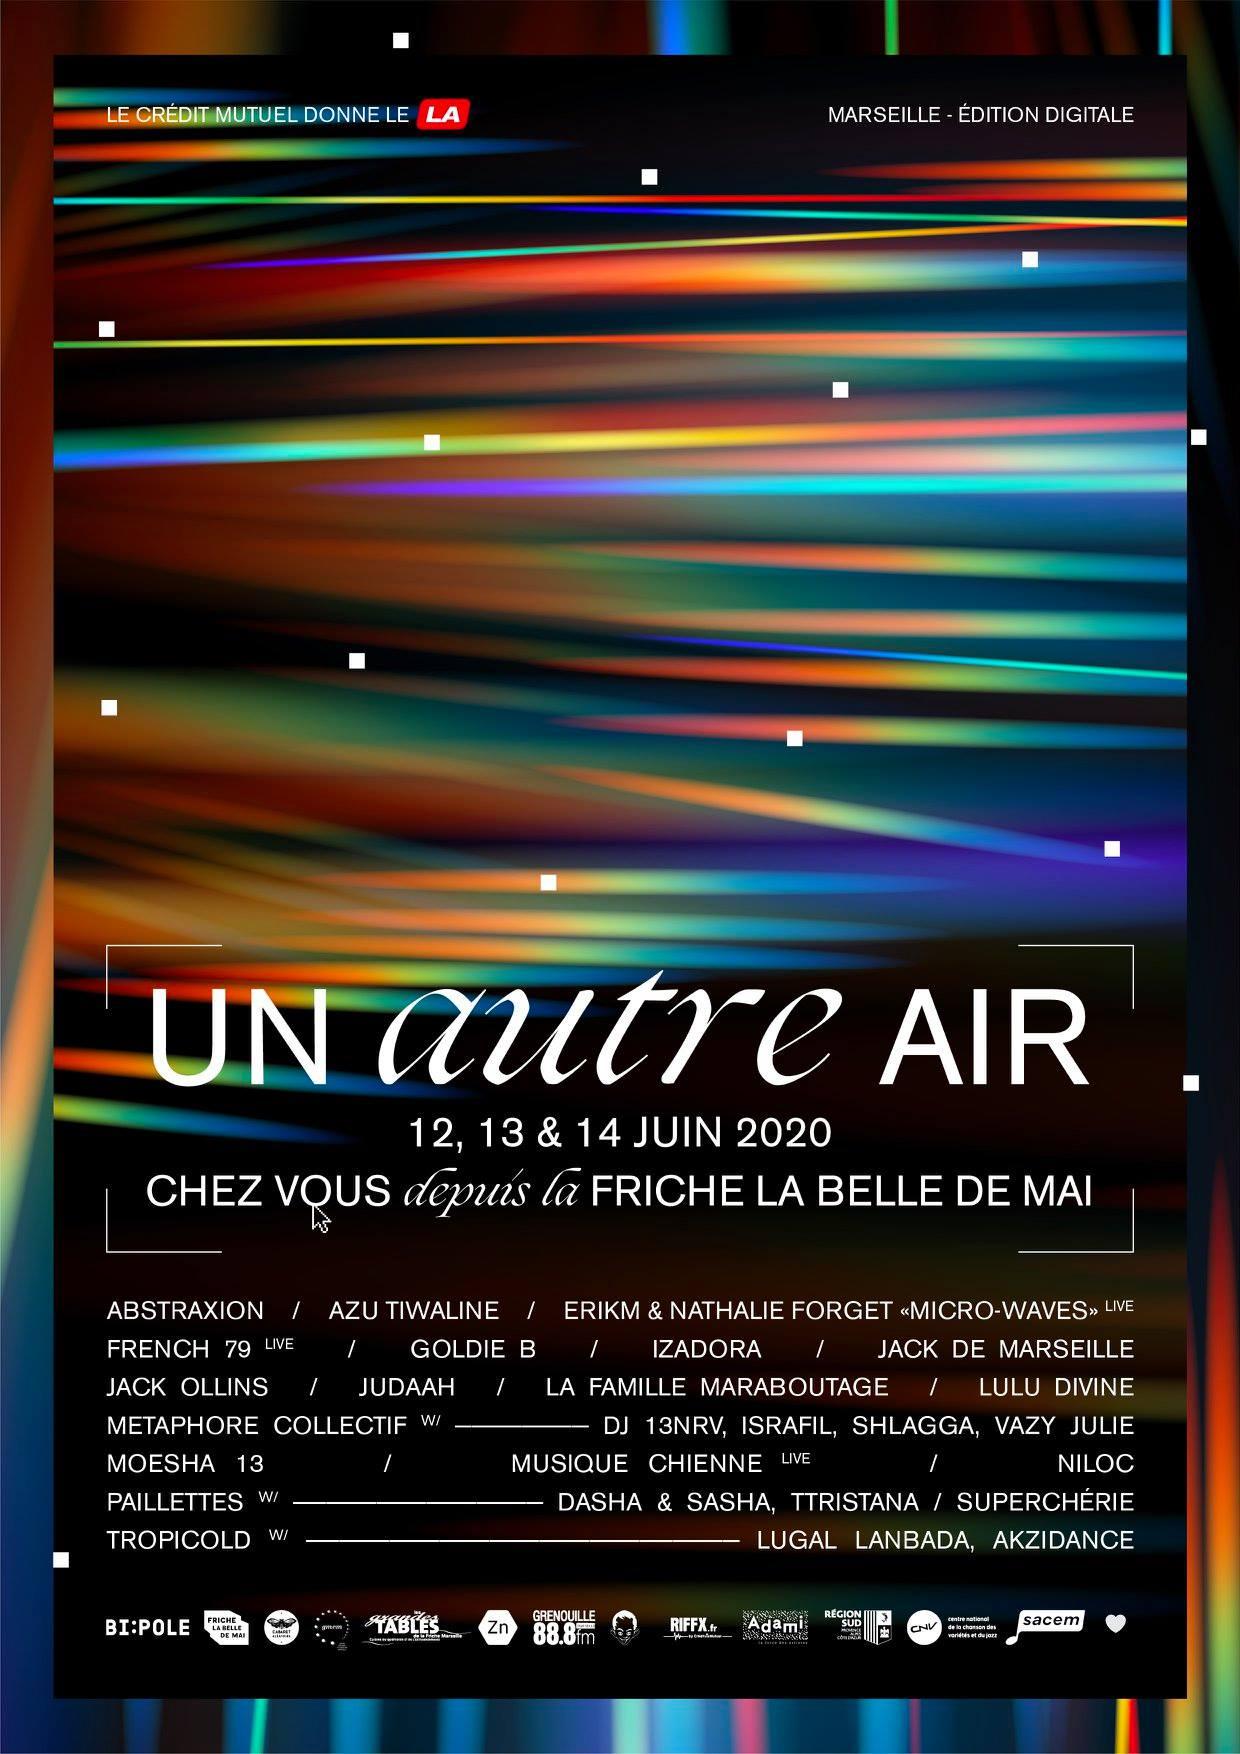 Don't miss the digital edition of Le Bon Air